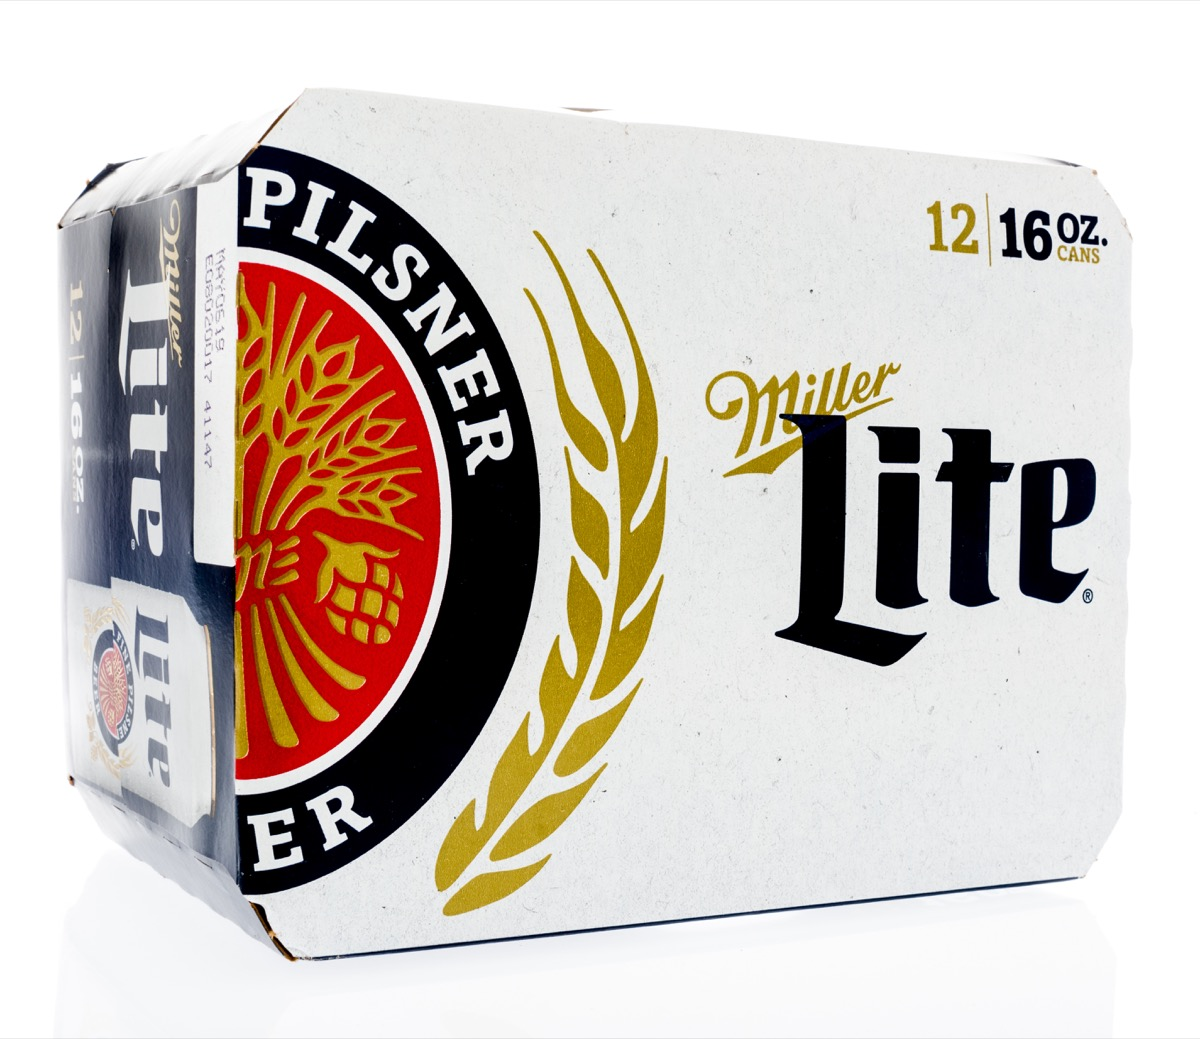 pack of miller light beer